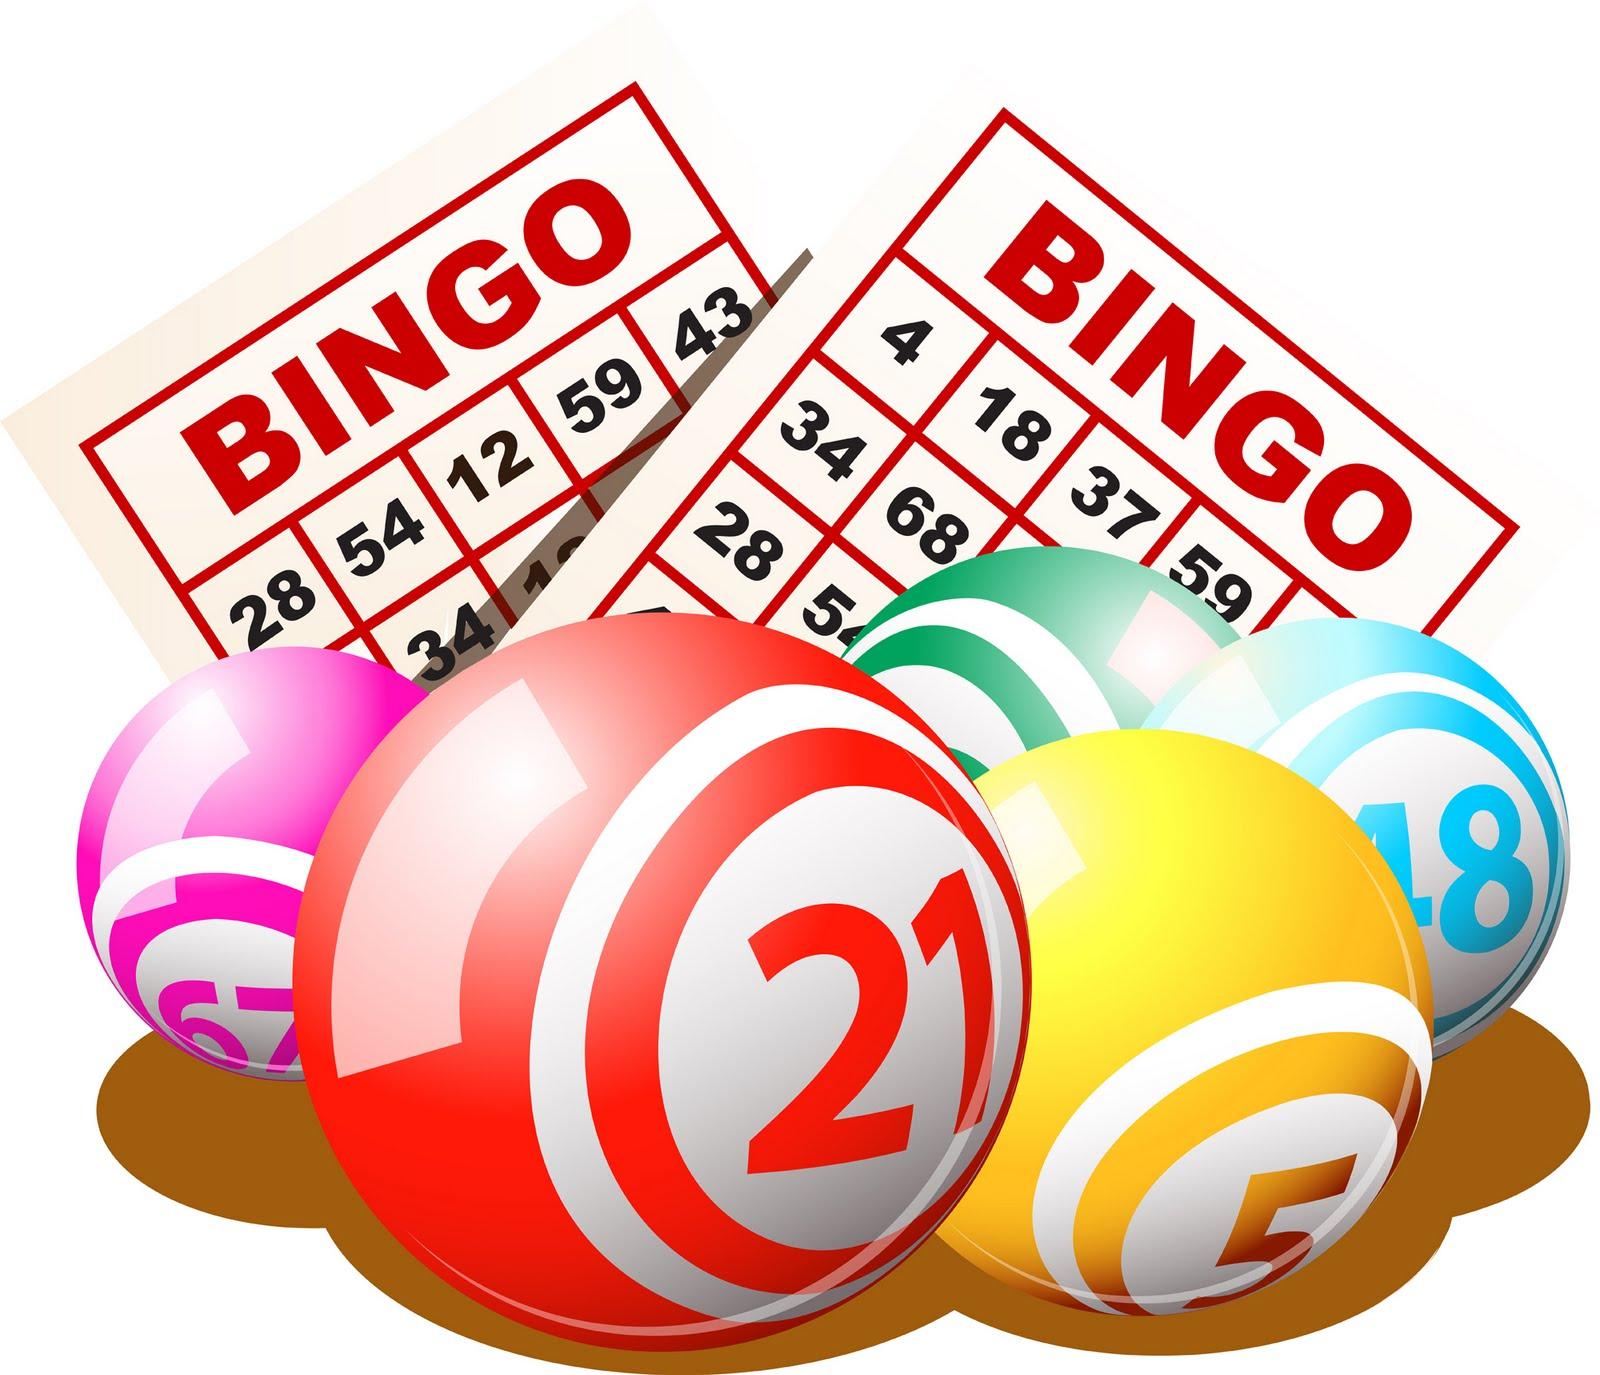 https://www.stthomas.ie/wp-content/uploads/2016/03/bingo.jpg